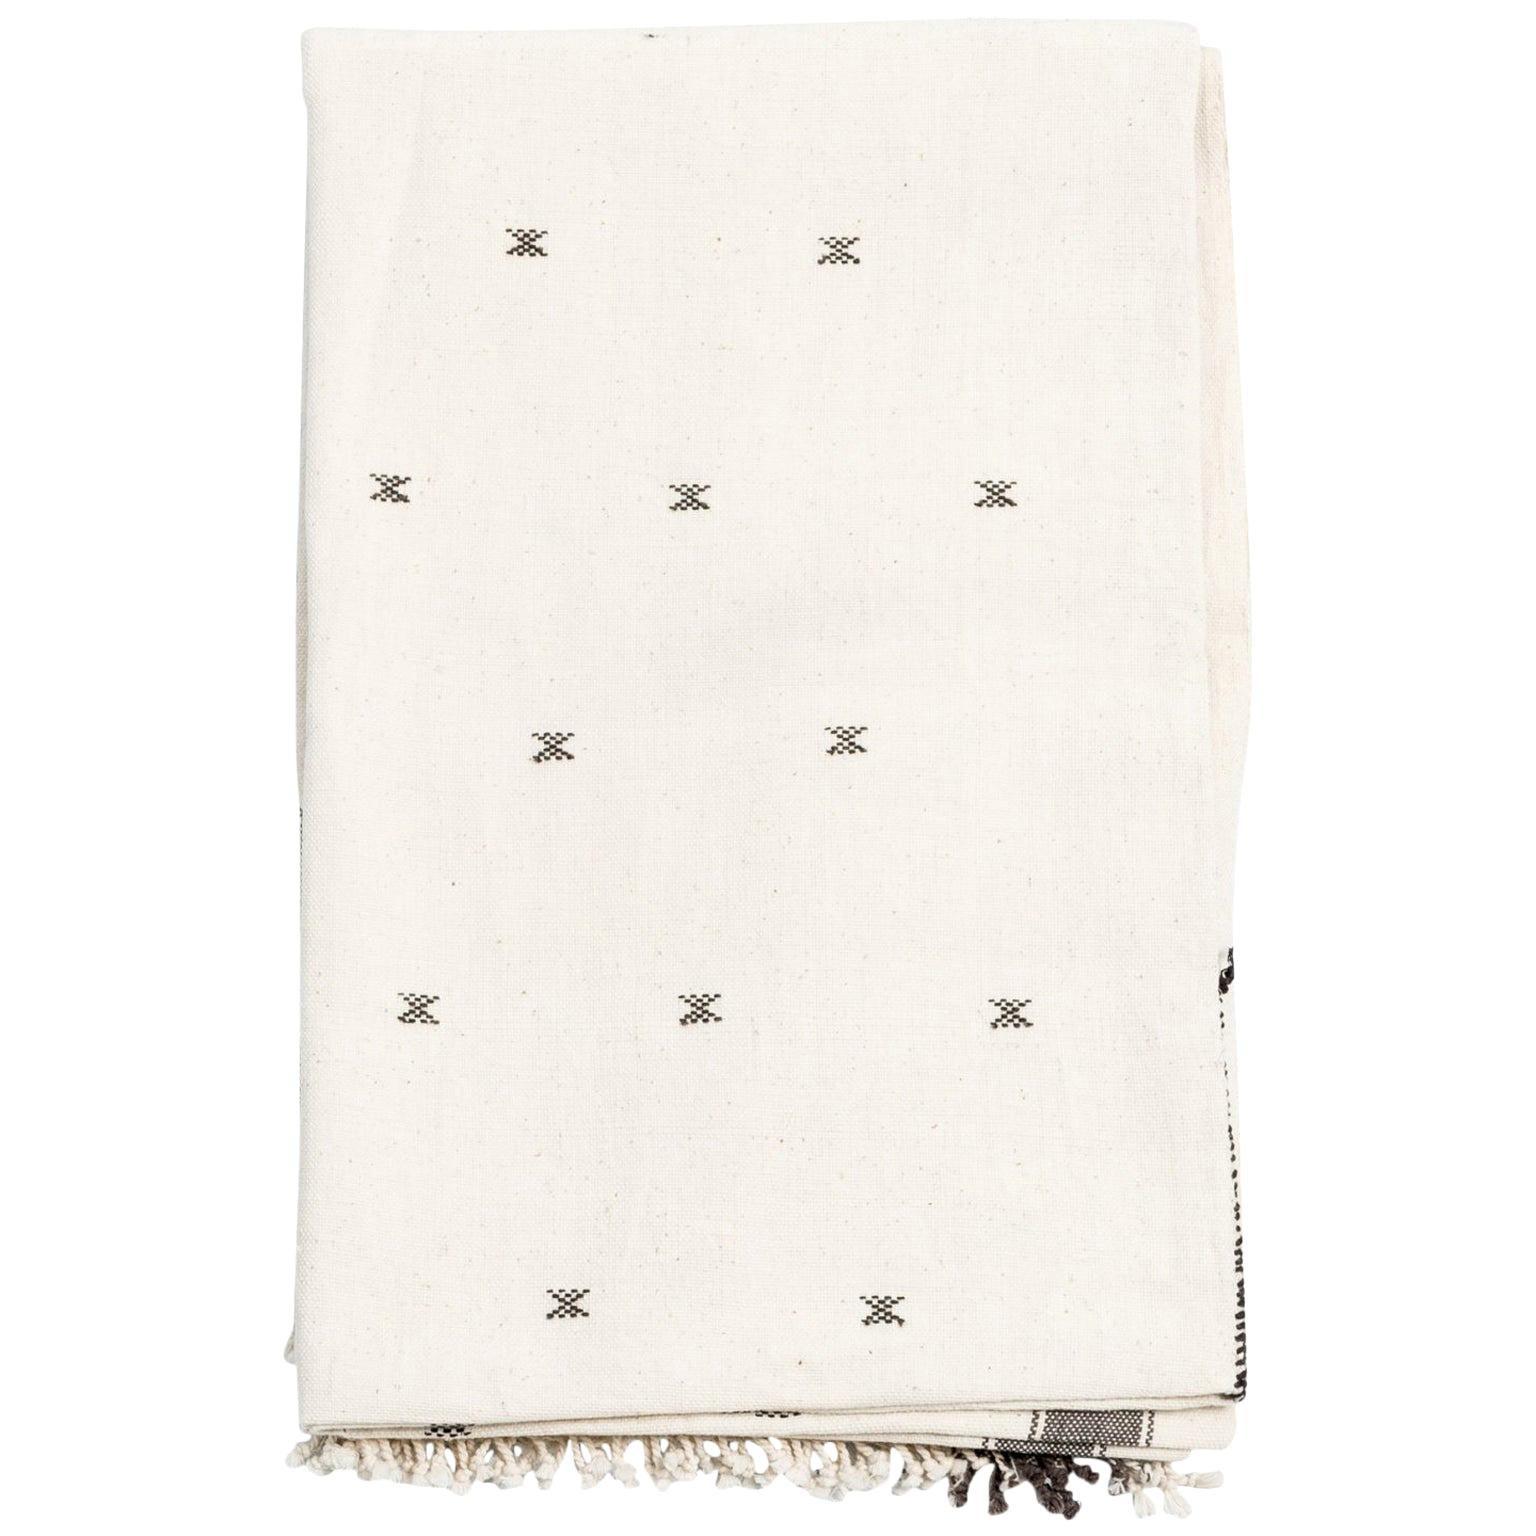 Amro Handloom King Size Bedpsread Coverlet Black & White, in Organic Cotton